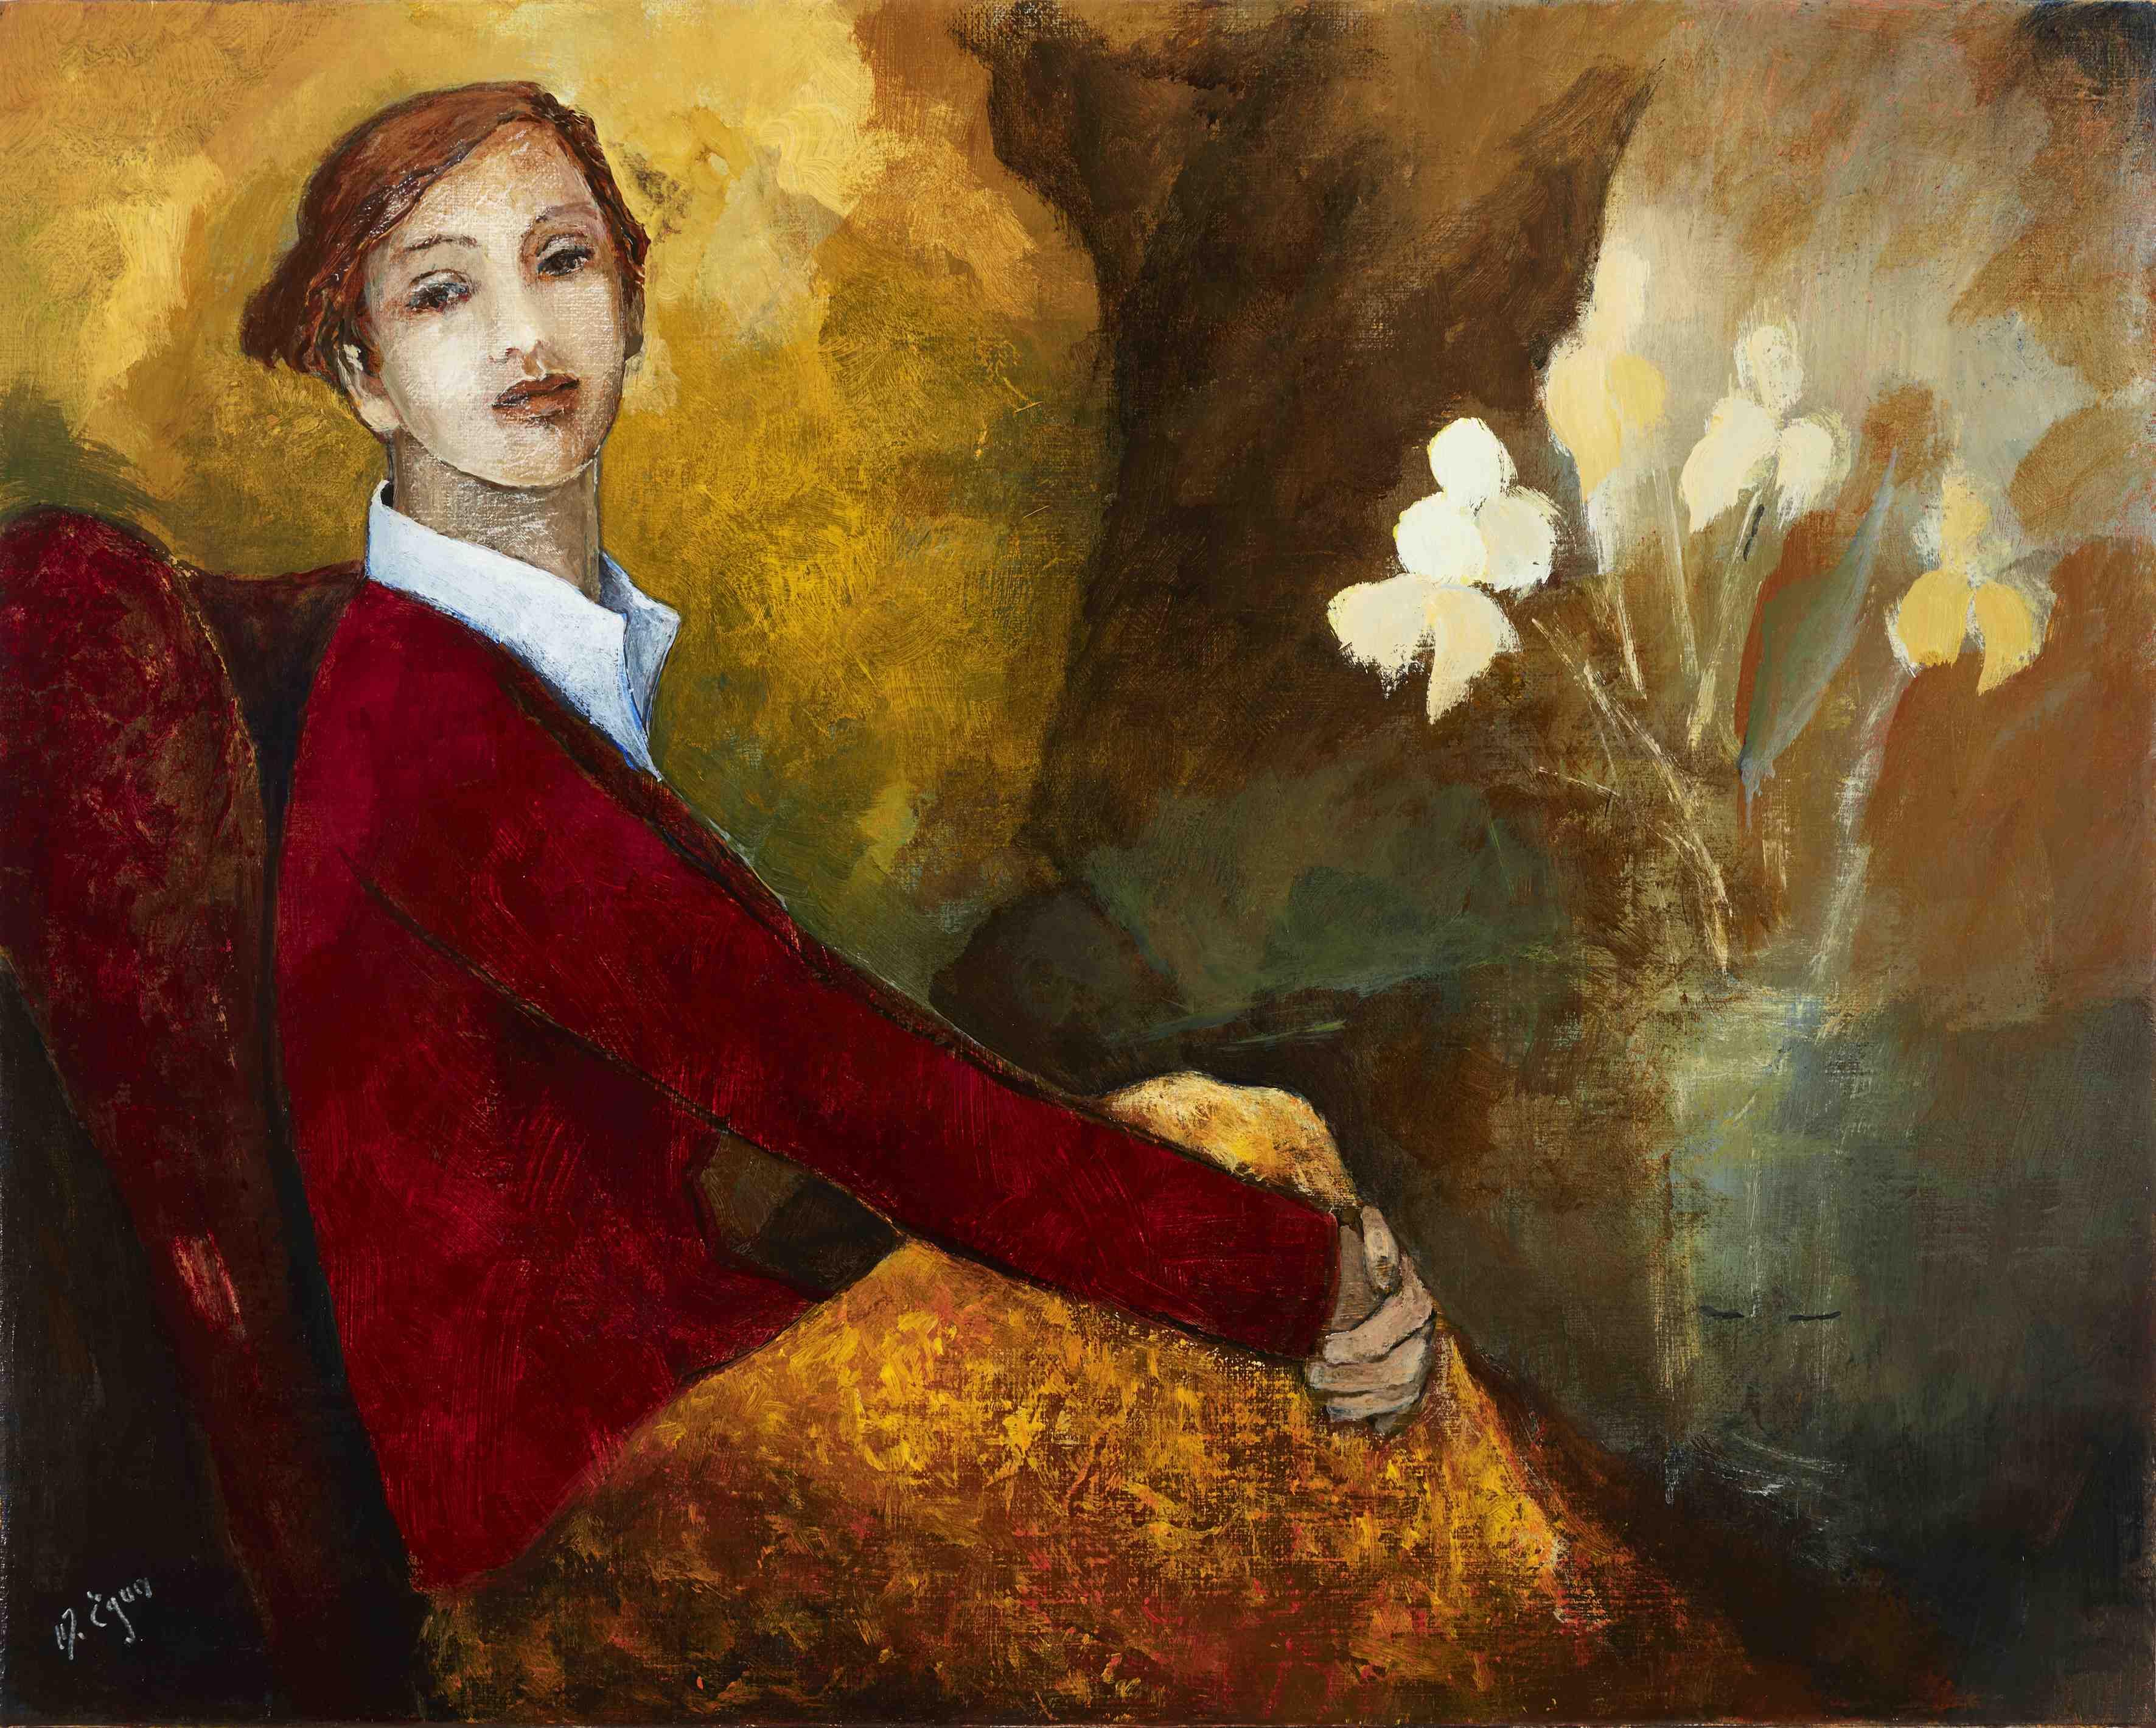 Margaret Egan, Curious, 39 x 49 cm, acrylic on linen